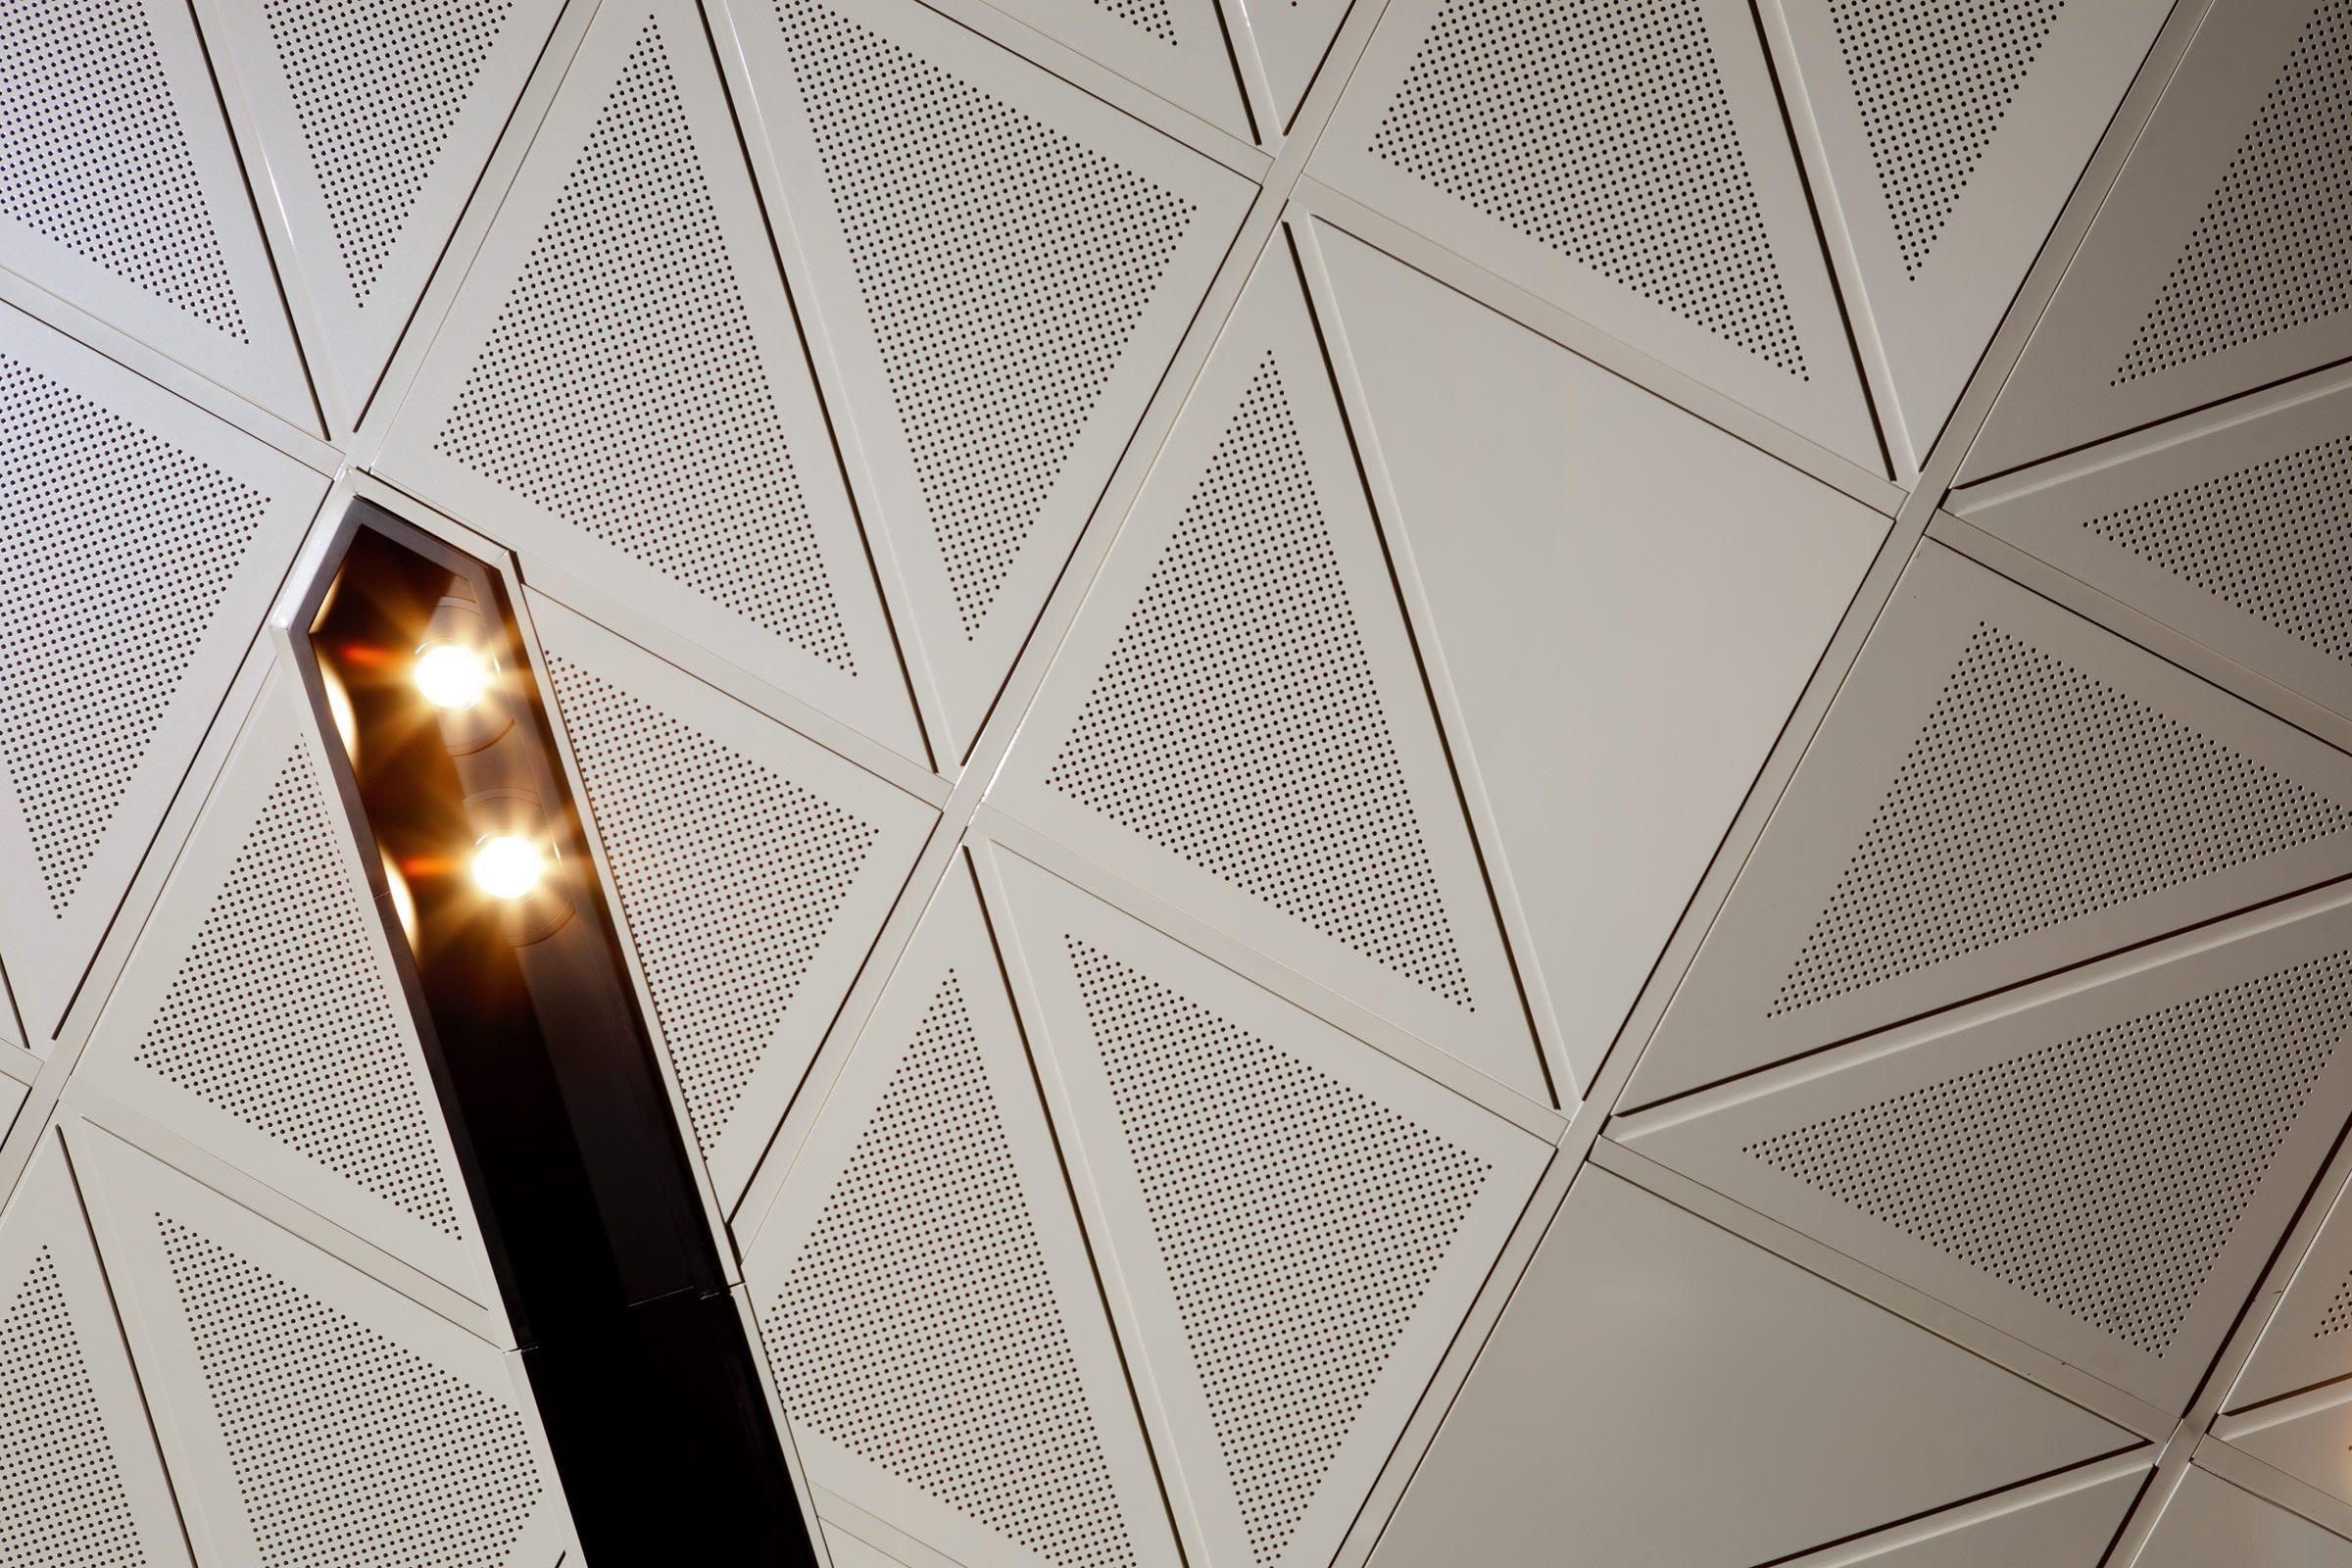 Au Ditile Atkar Carreaux De Plafond Plafond Bois Plafond